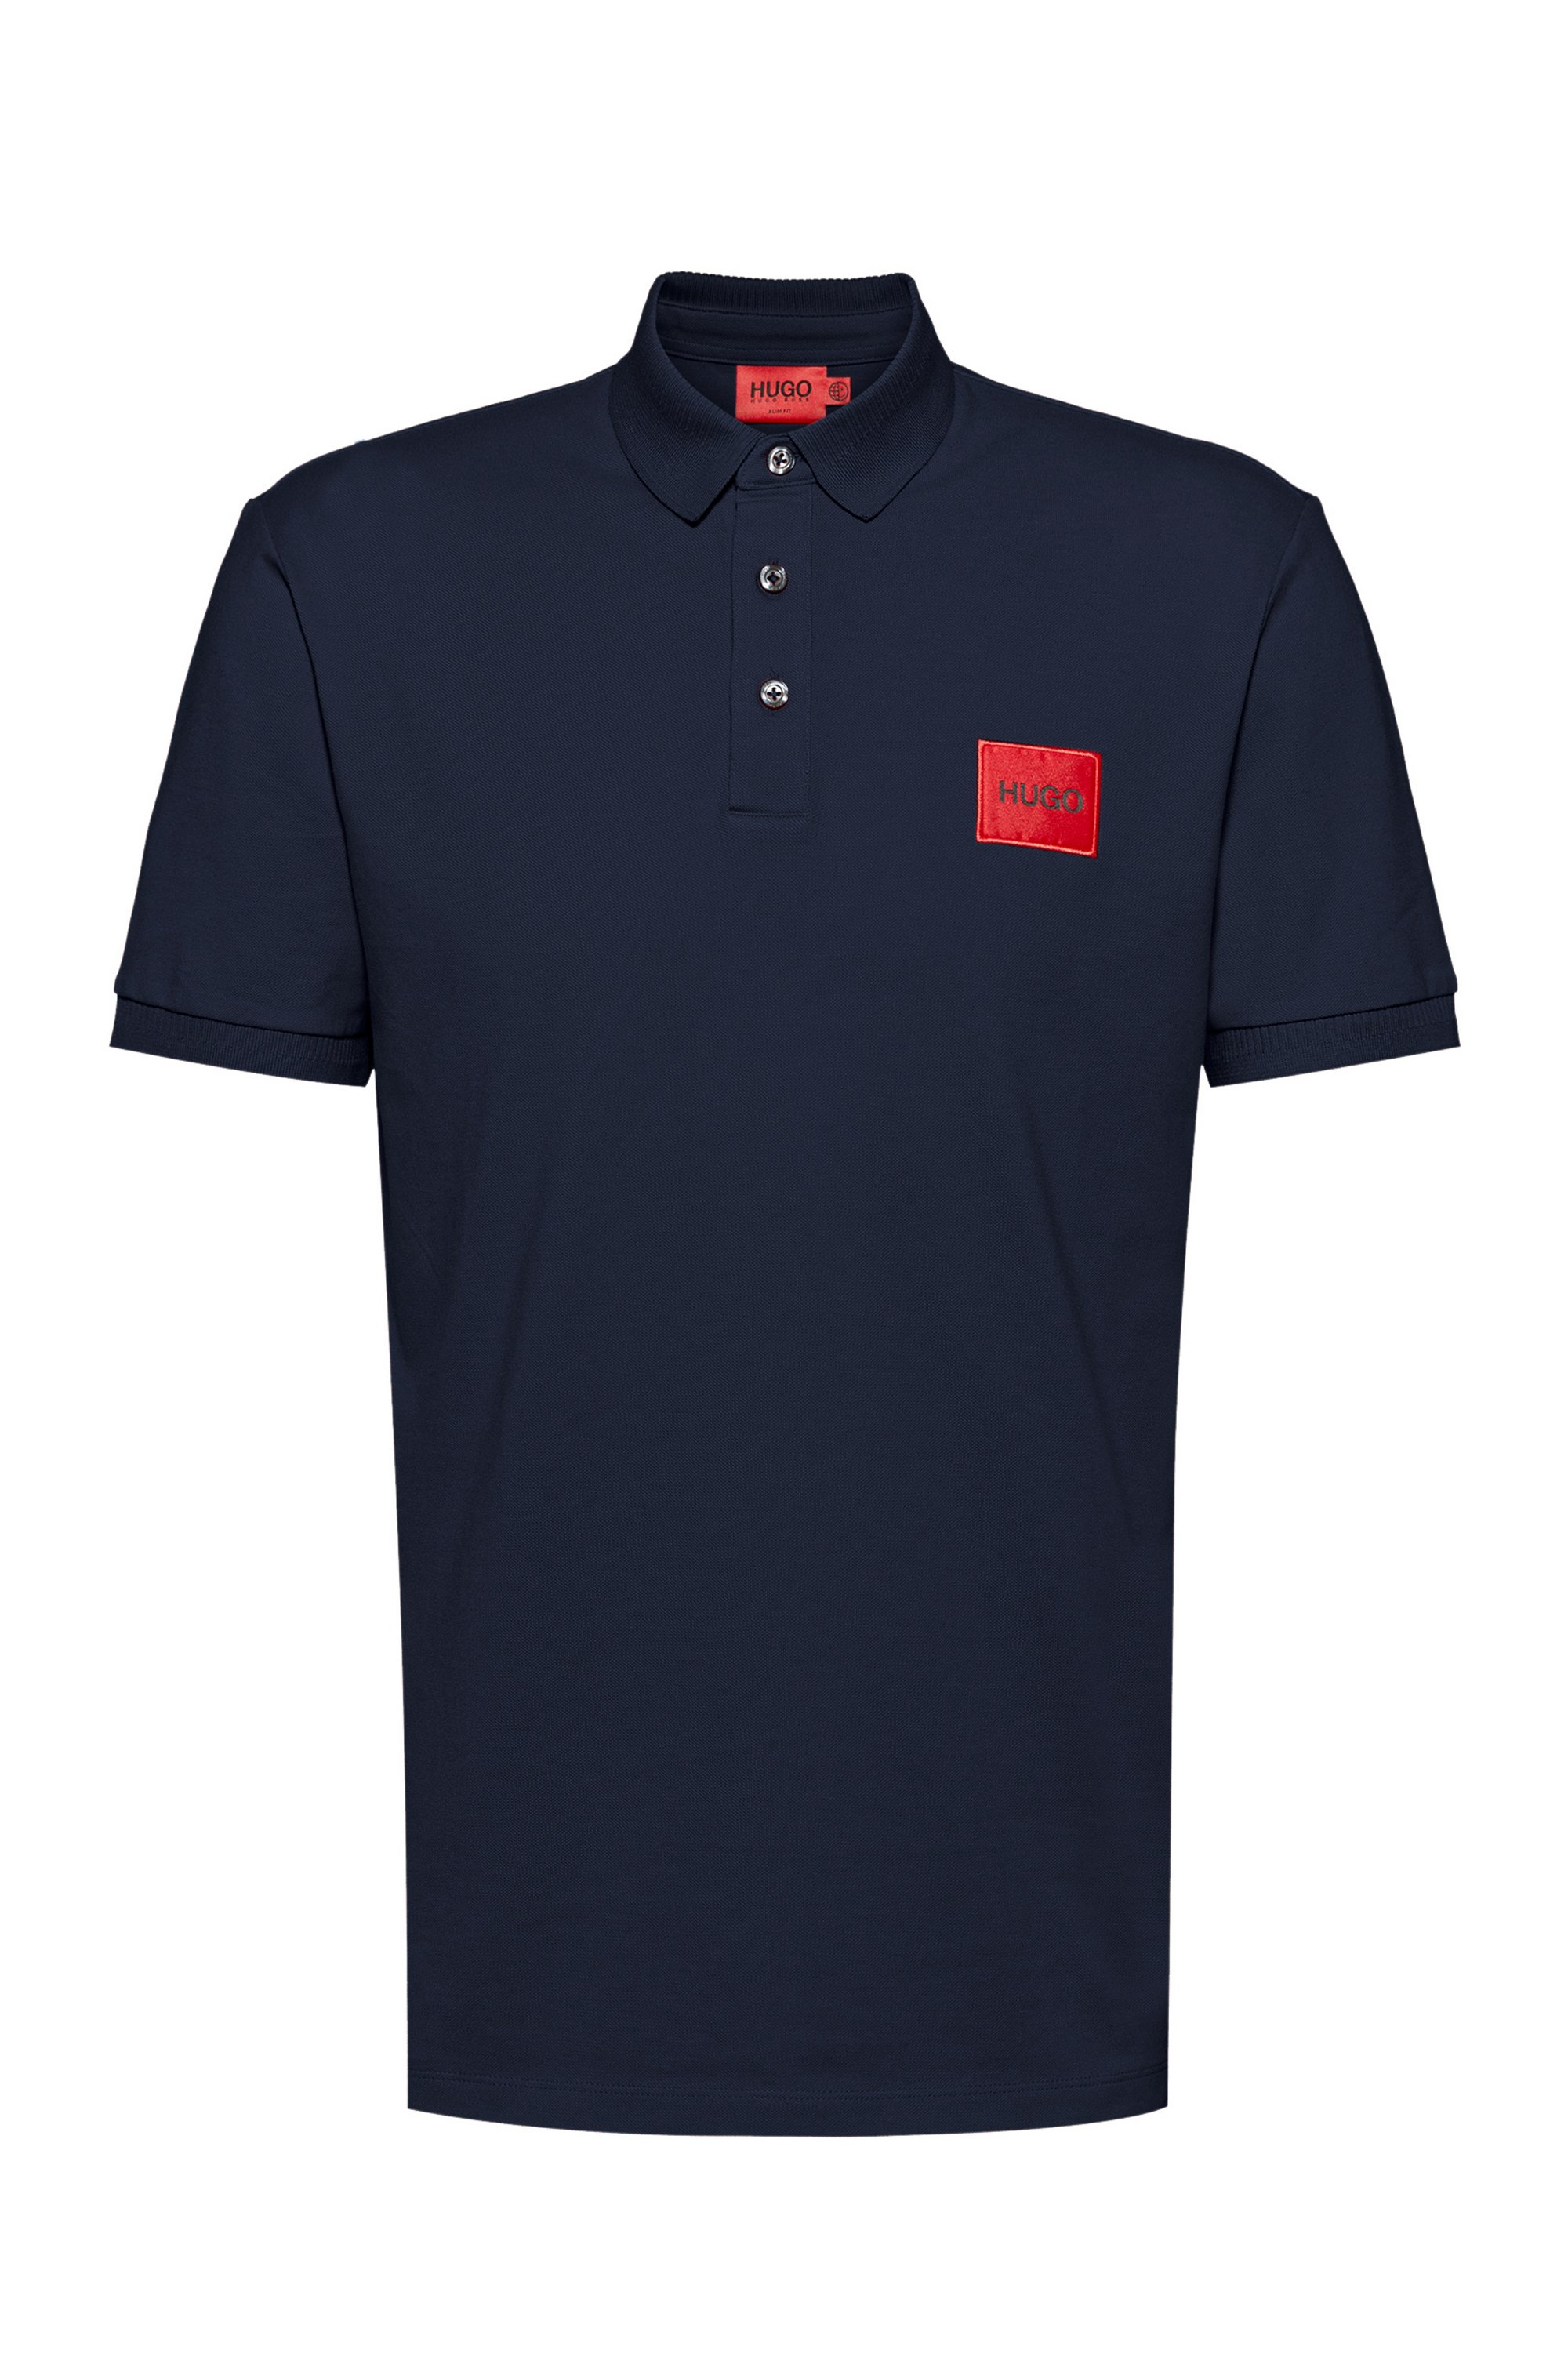 Slim-fit cotton-piqué polo shirt with logo patch, Dark Blue